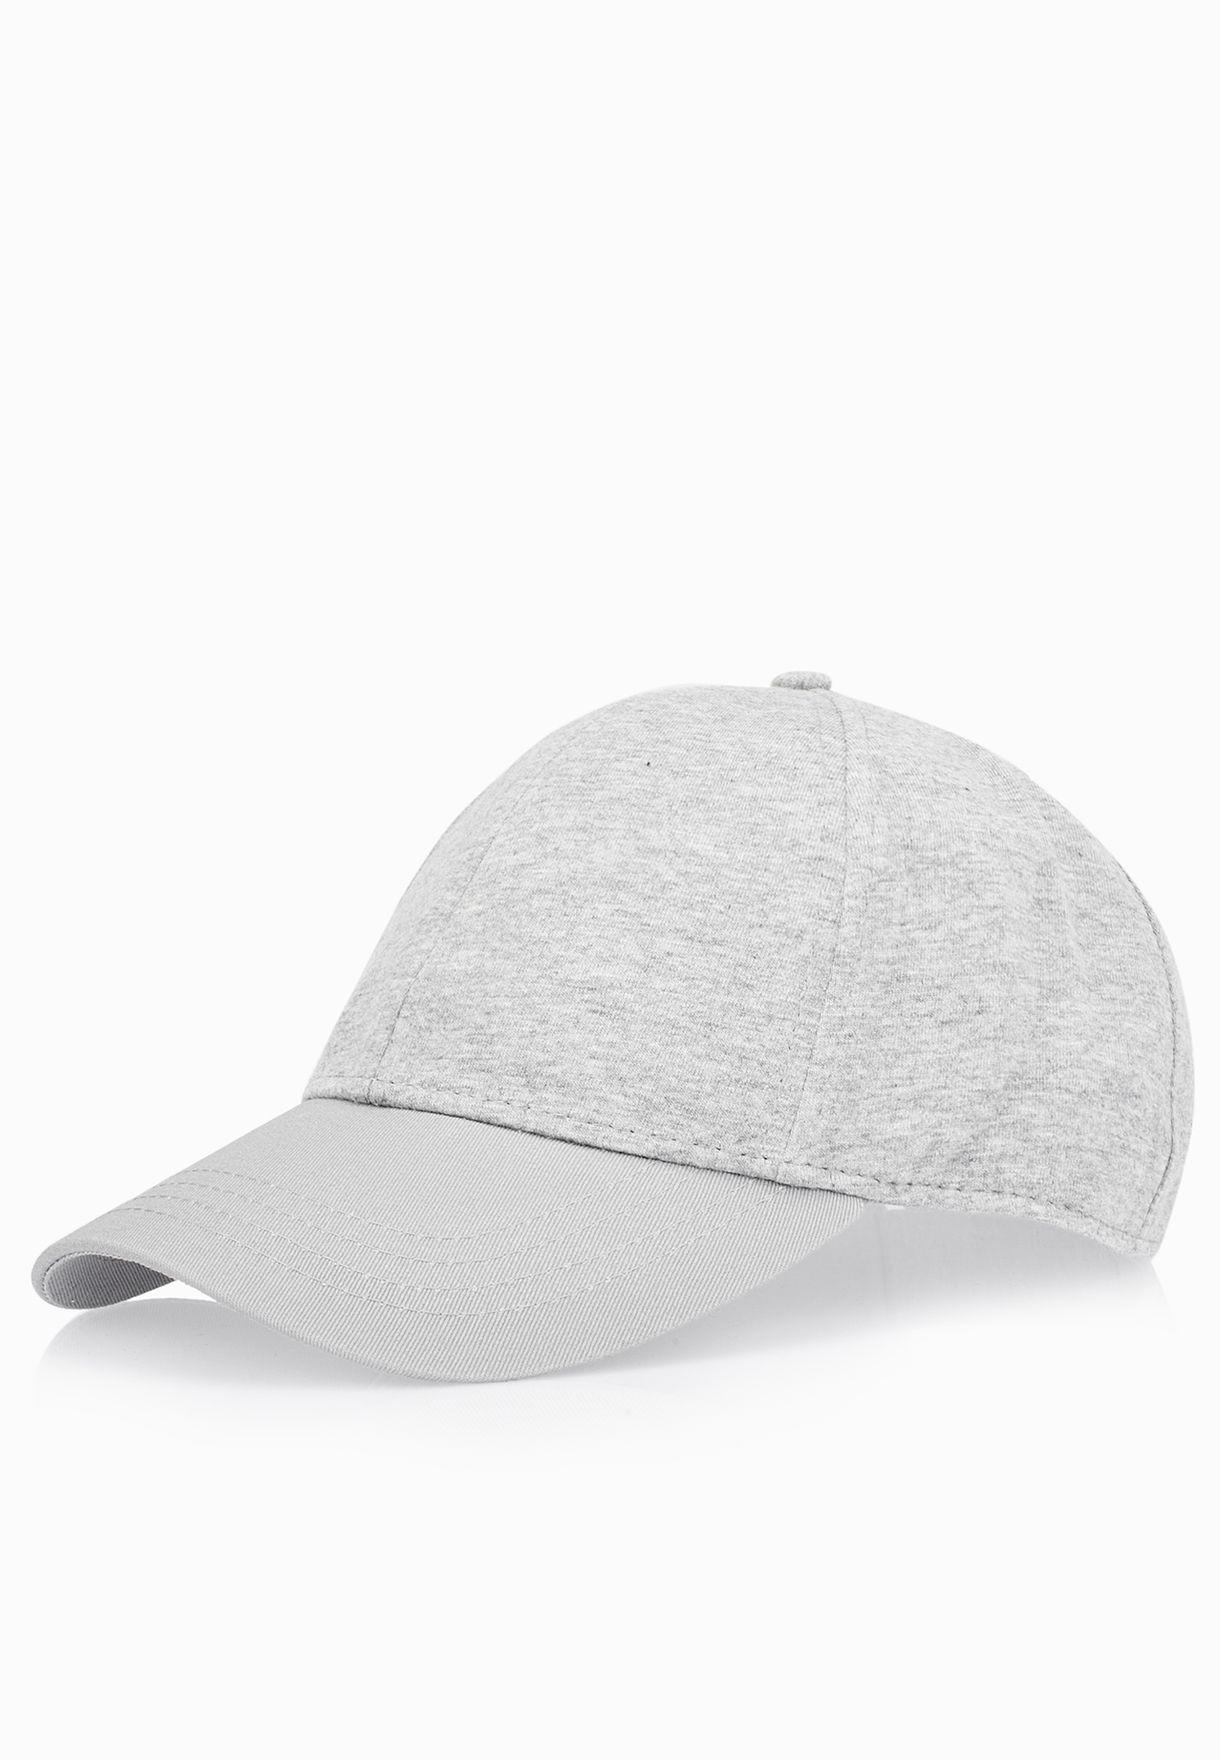 45338cd3aaebb Shop Topman grey Casual Cap 56J81MCHR for Men in Bahrain - TO857AC28XBN